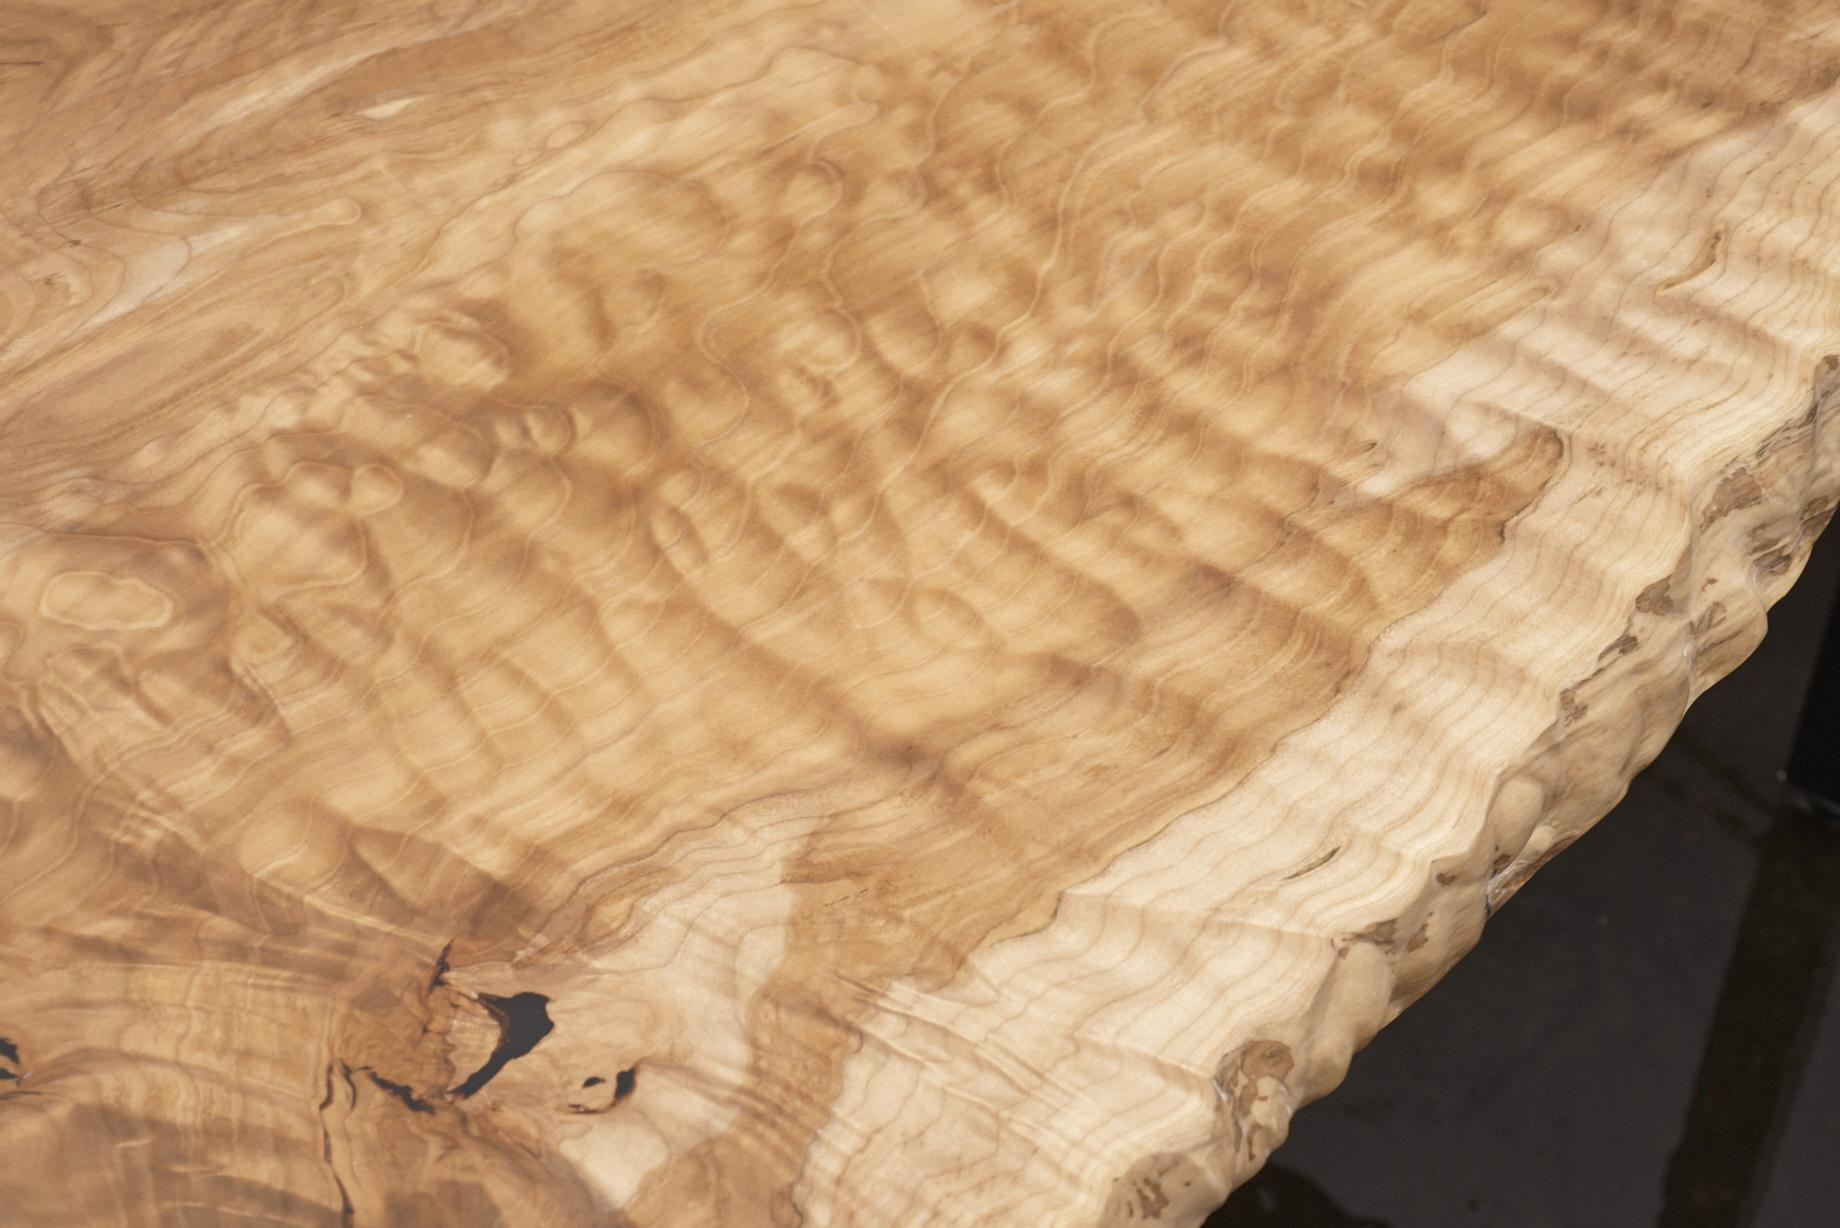 Maple slab grain detail.